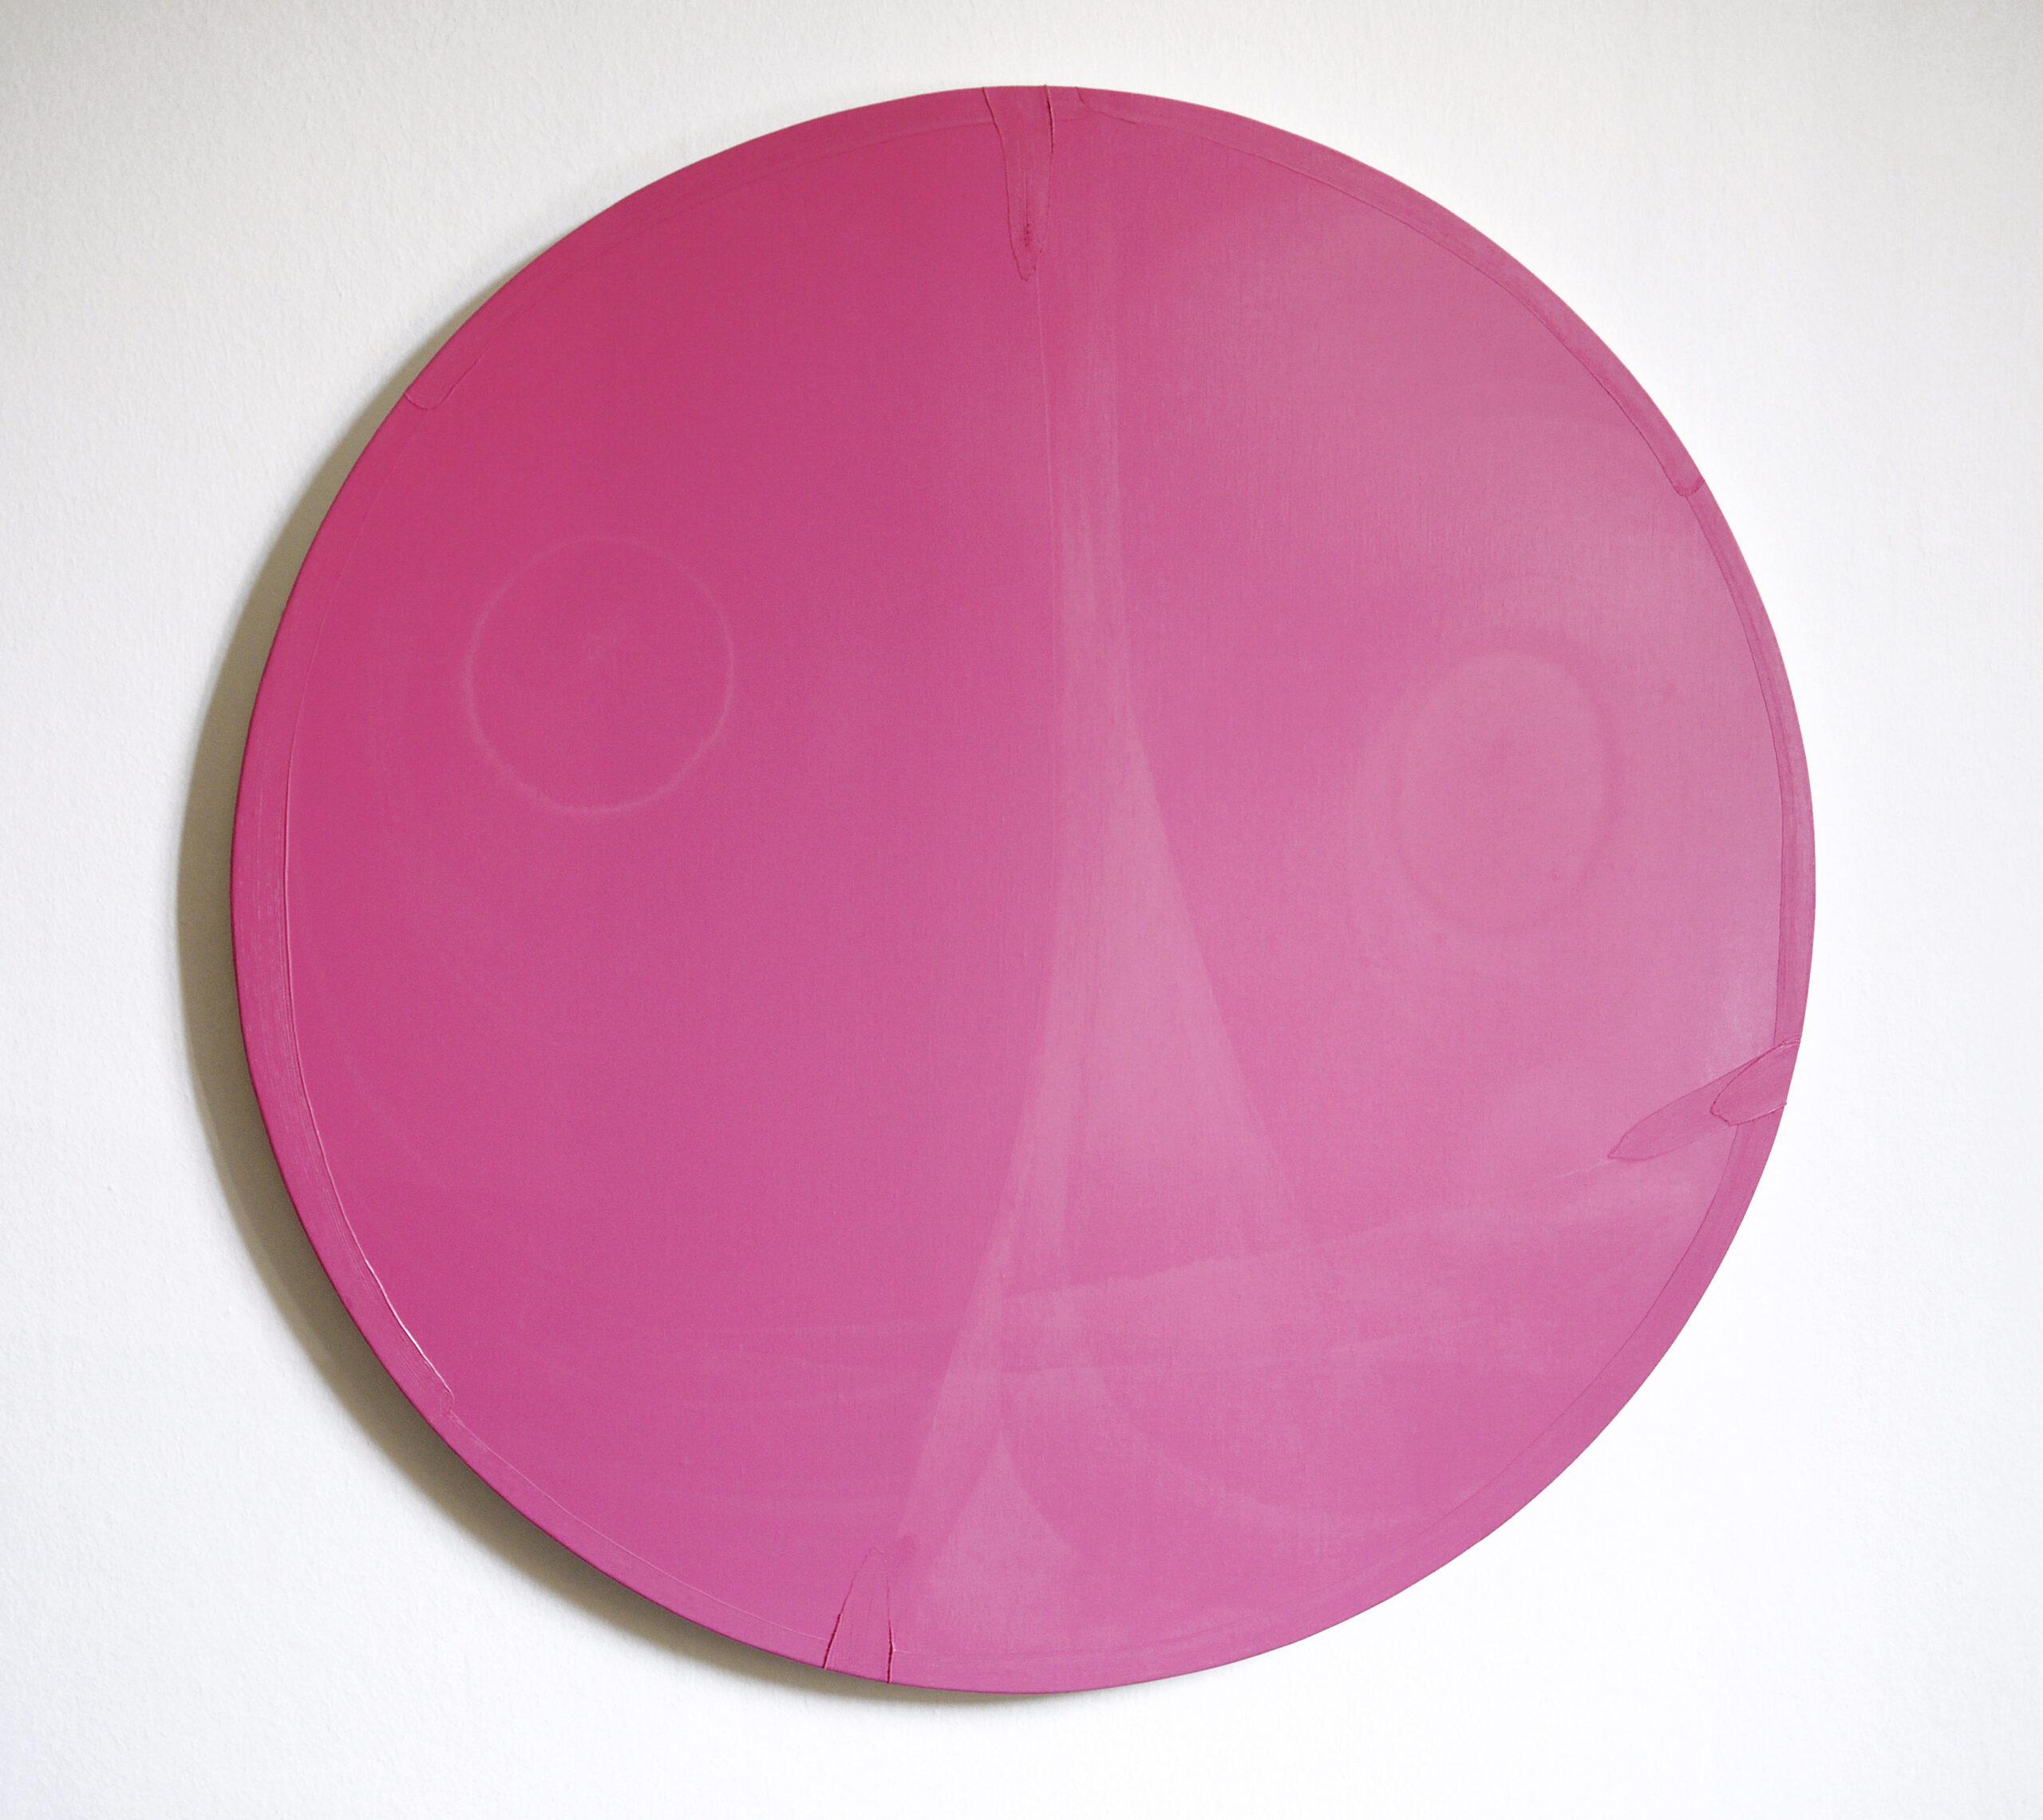 Antonio Catelani - flying kisses (pink), 2020 oil on canvas cm 80 Ø